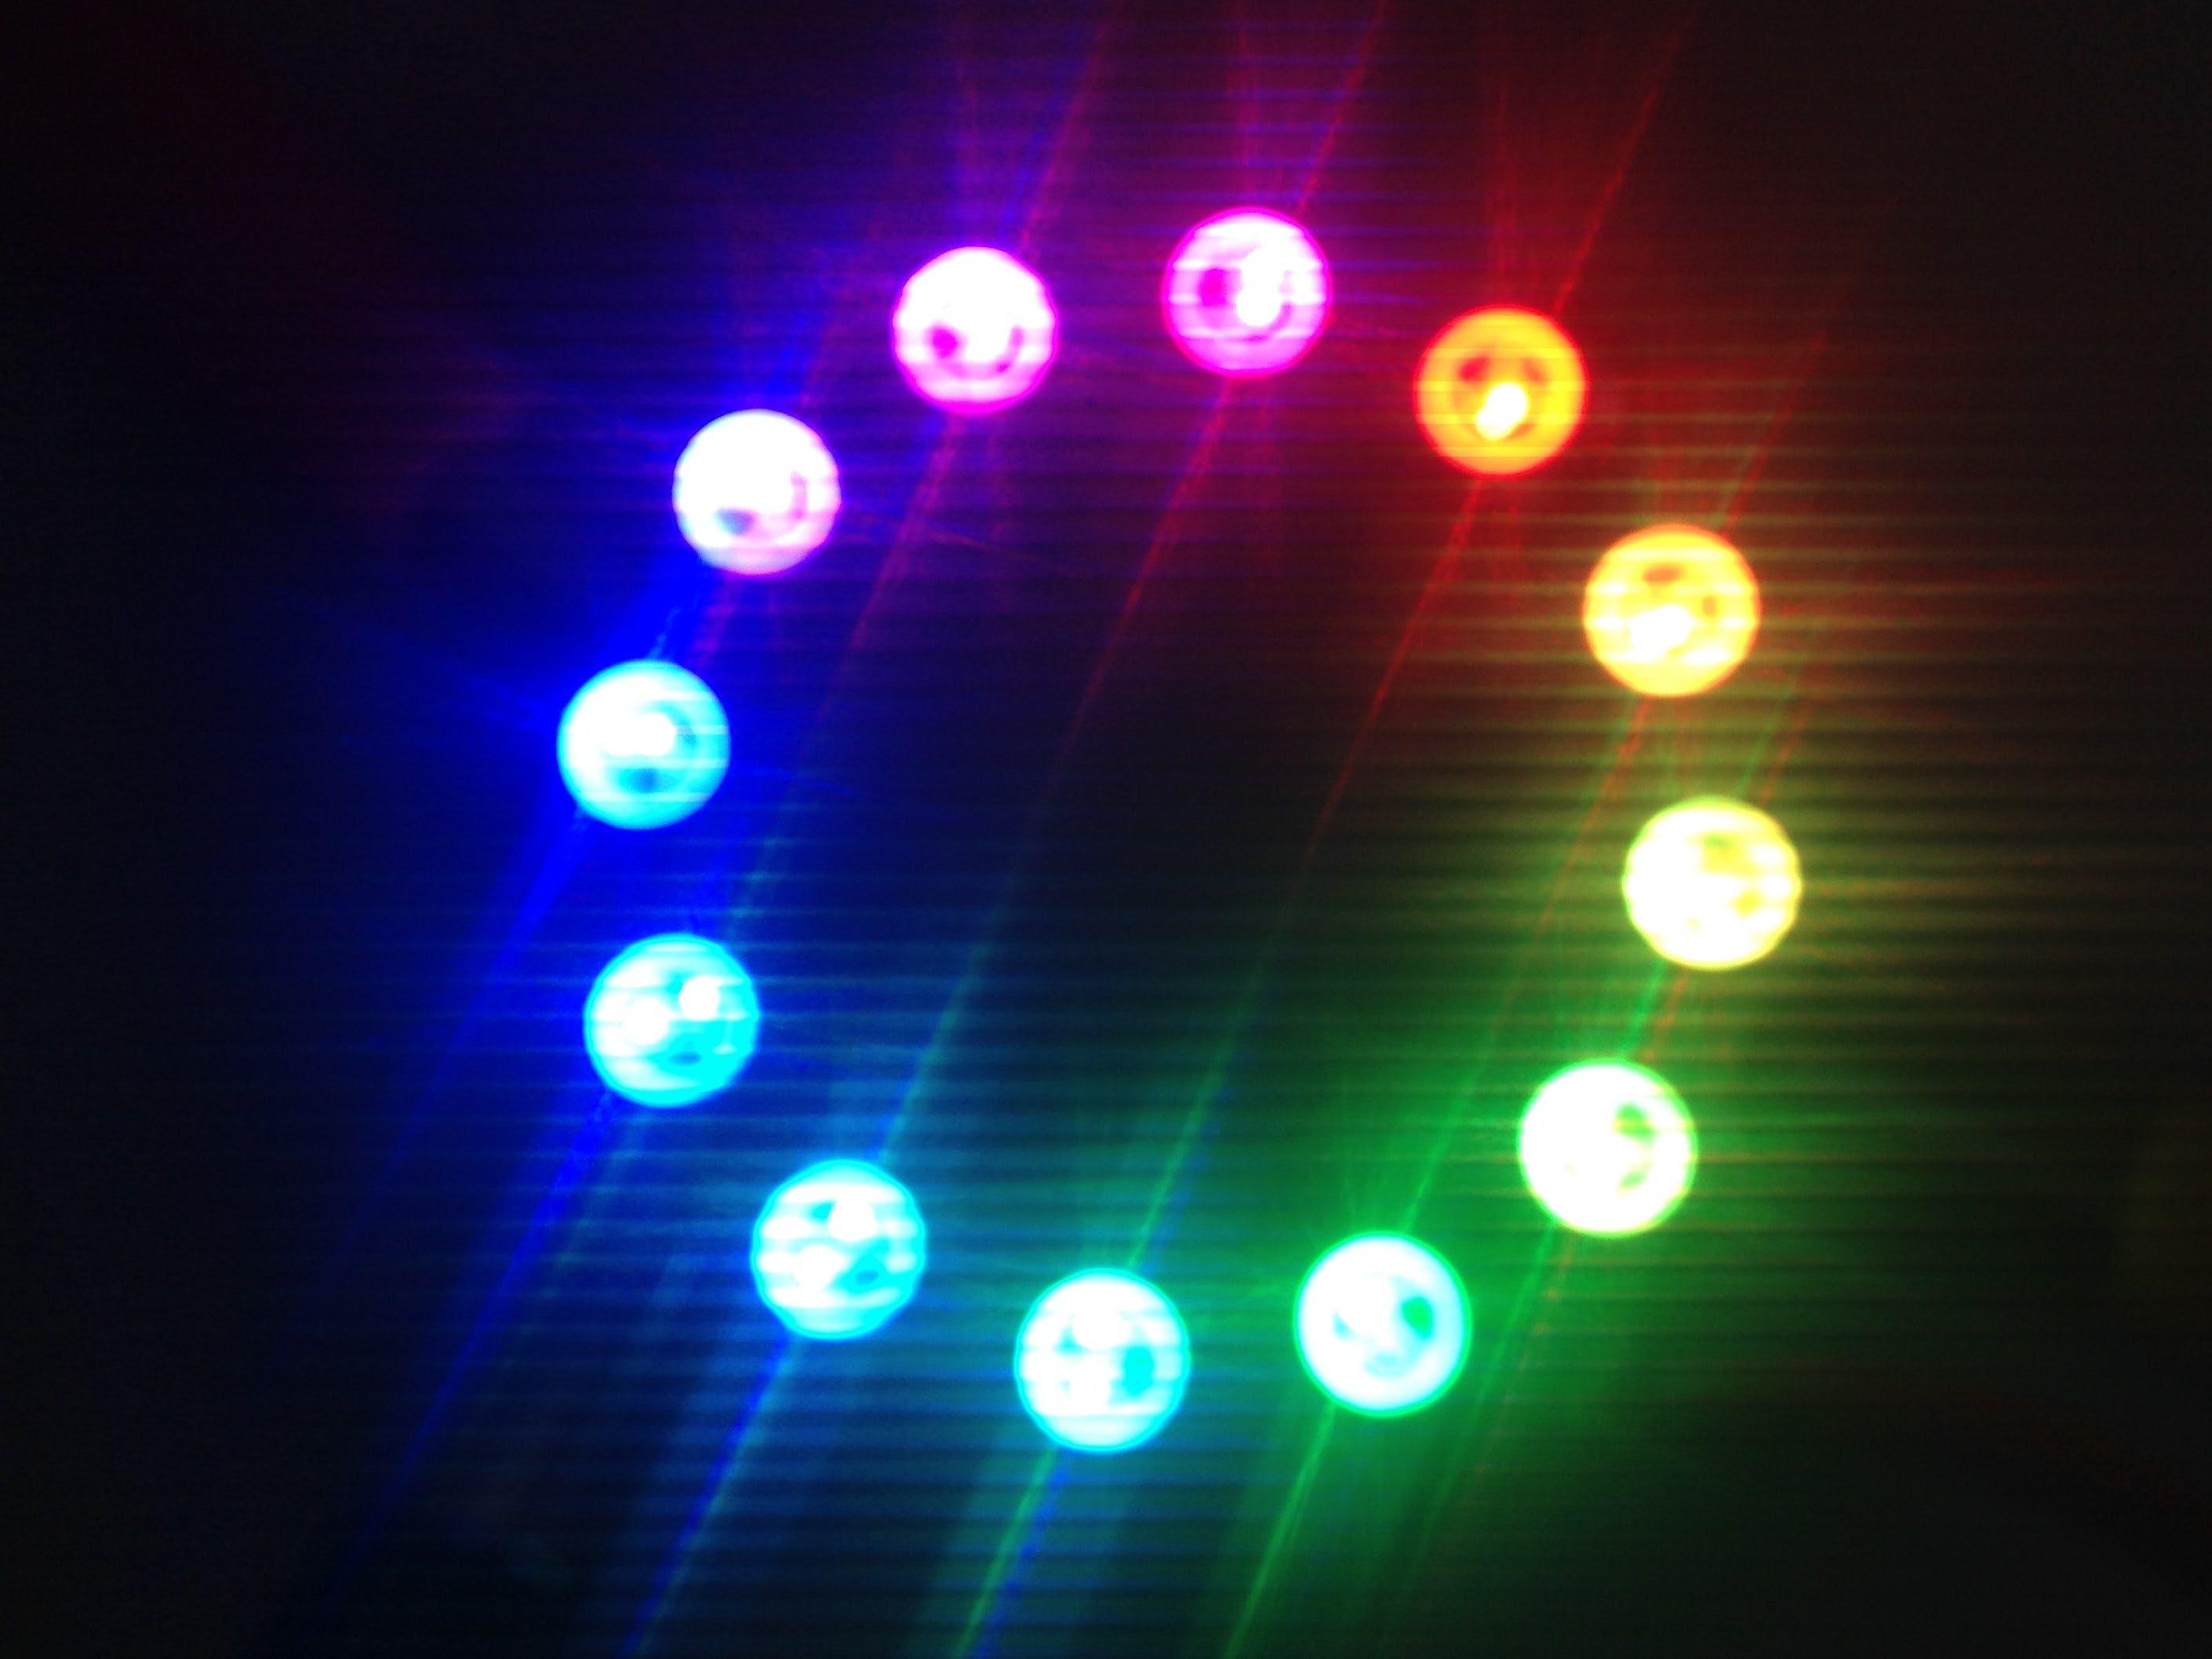 MyAdafruit Neopixel Ring With 12 LEDs - Unboxing